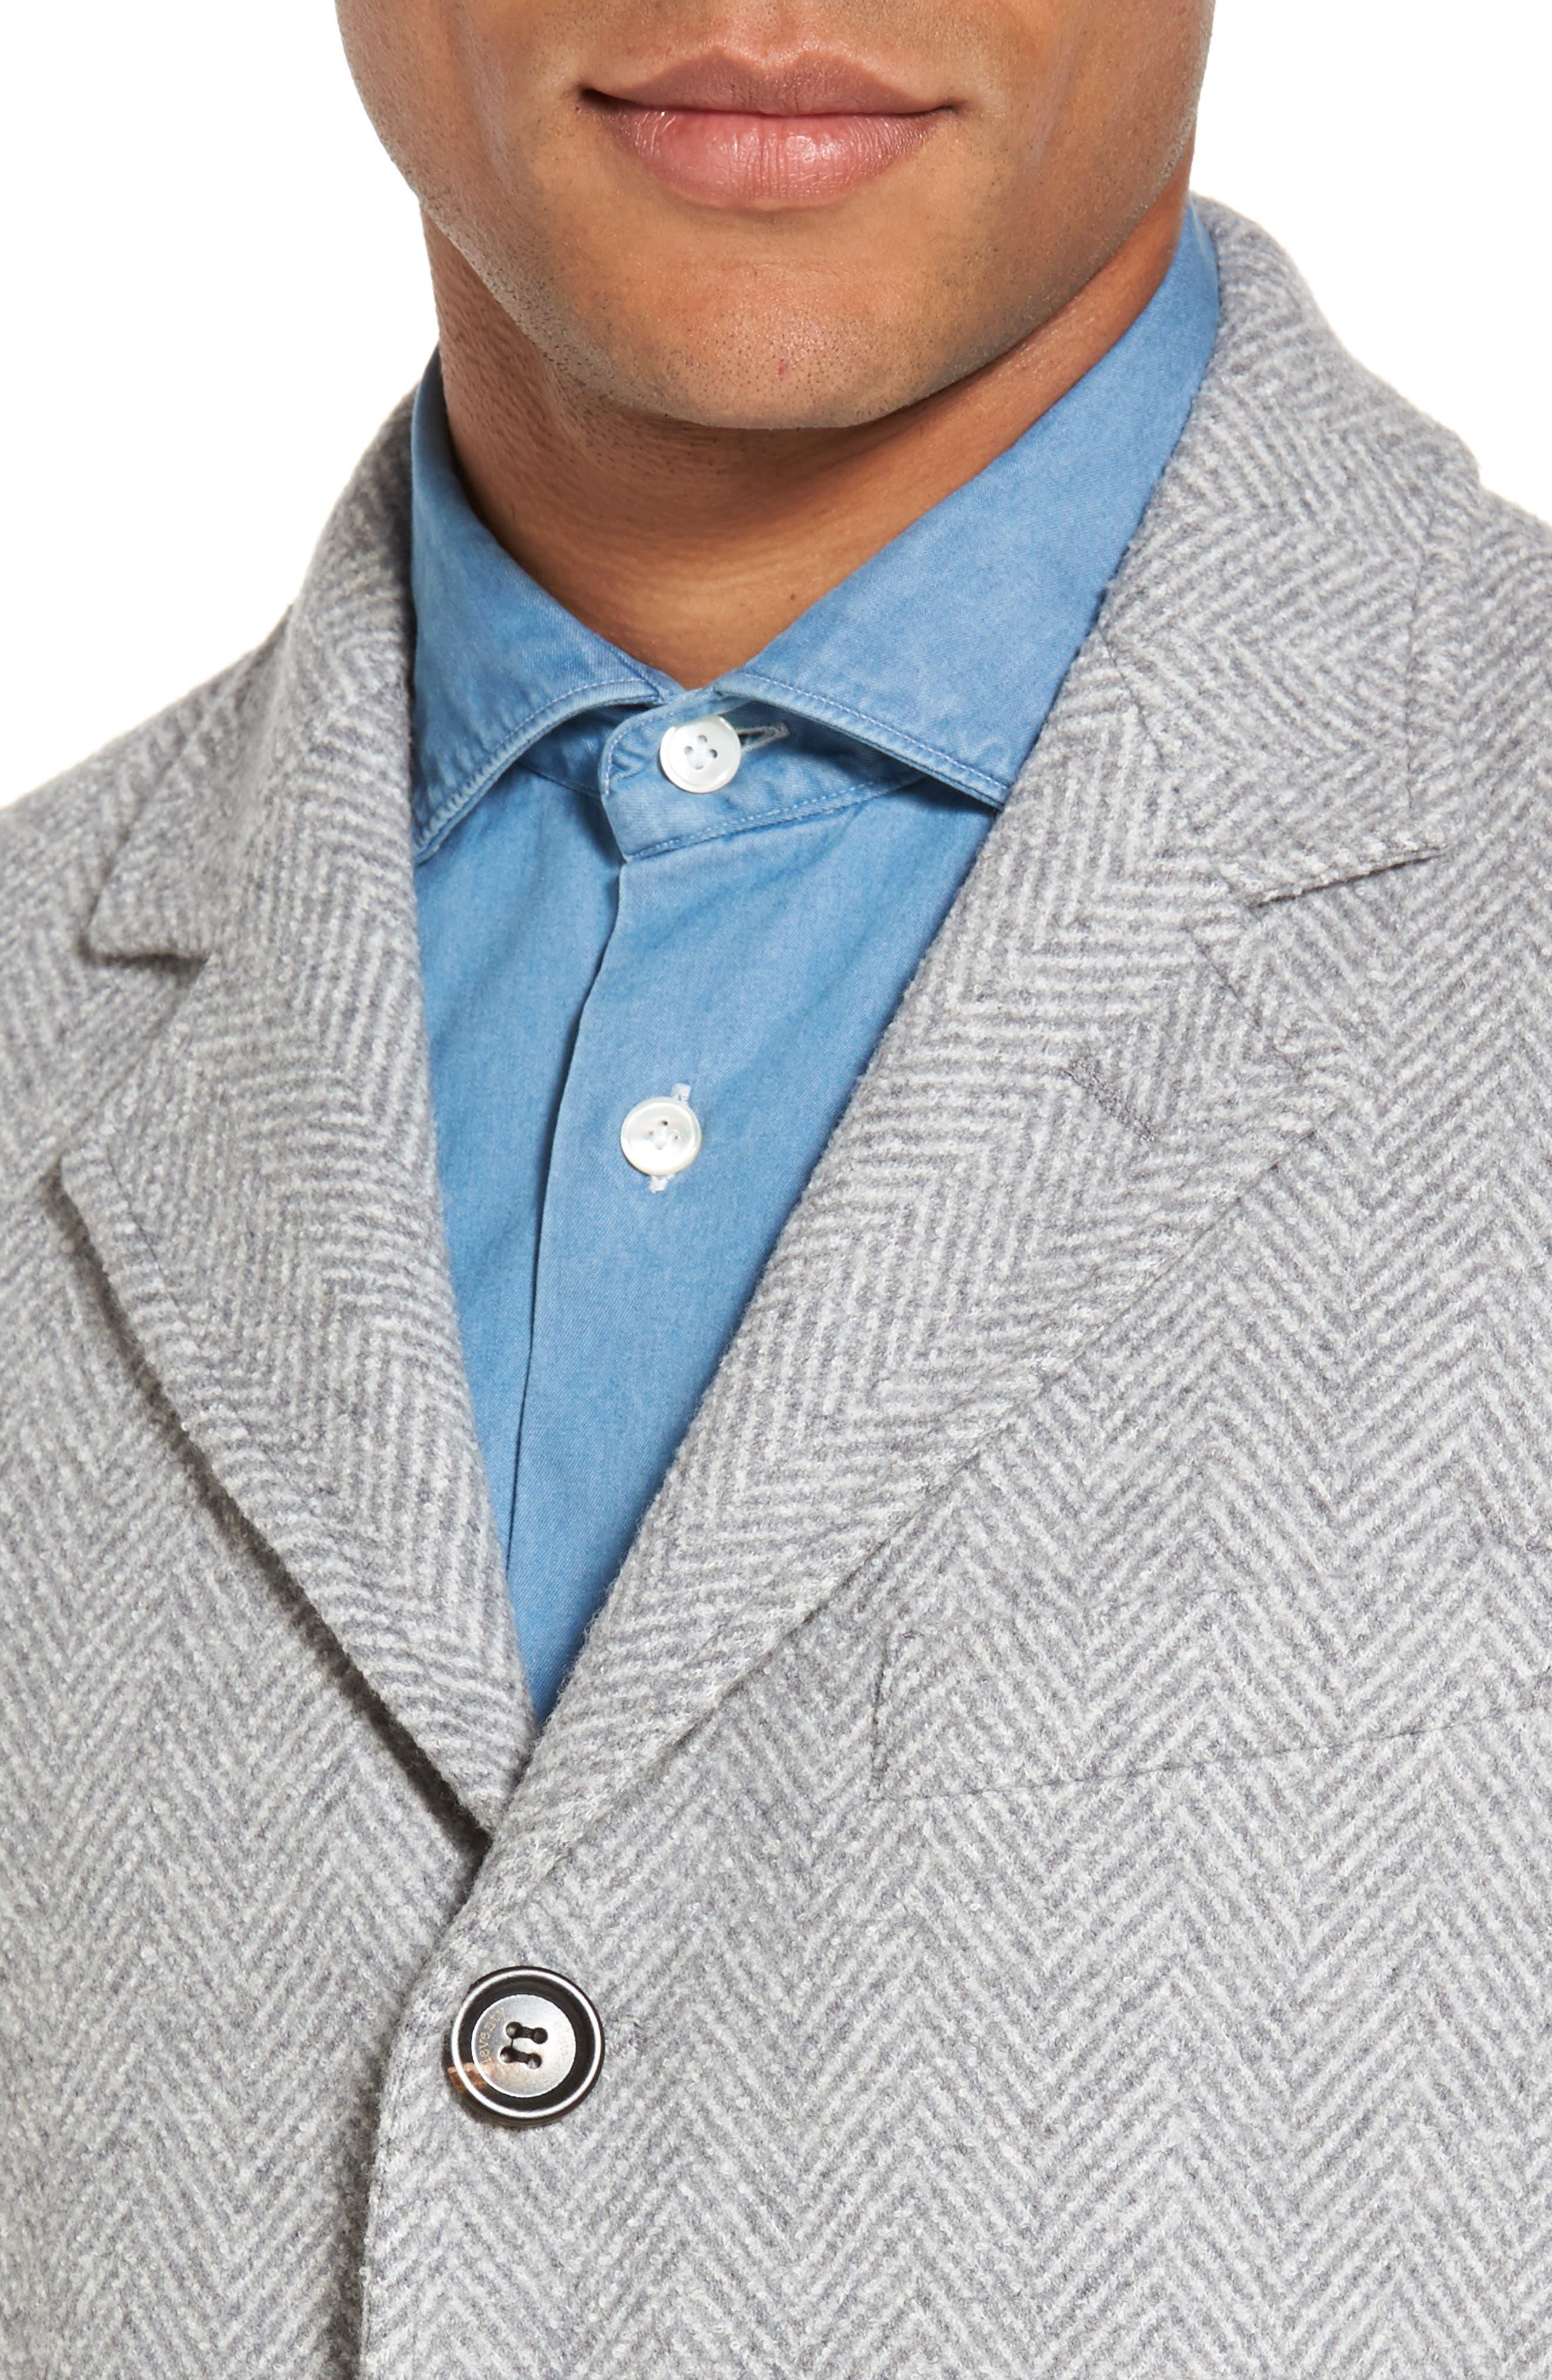 Herringbone Wool Blend Overcoat,                             Alternate thumbnail 4, color,